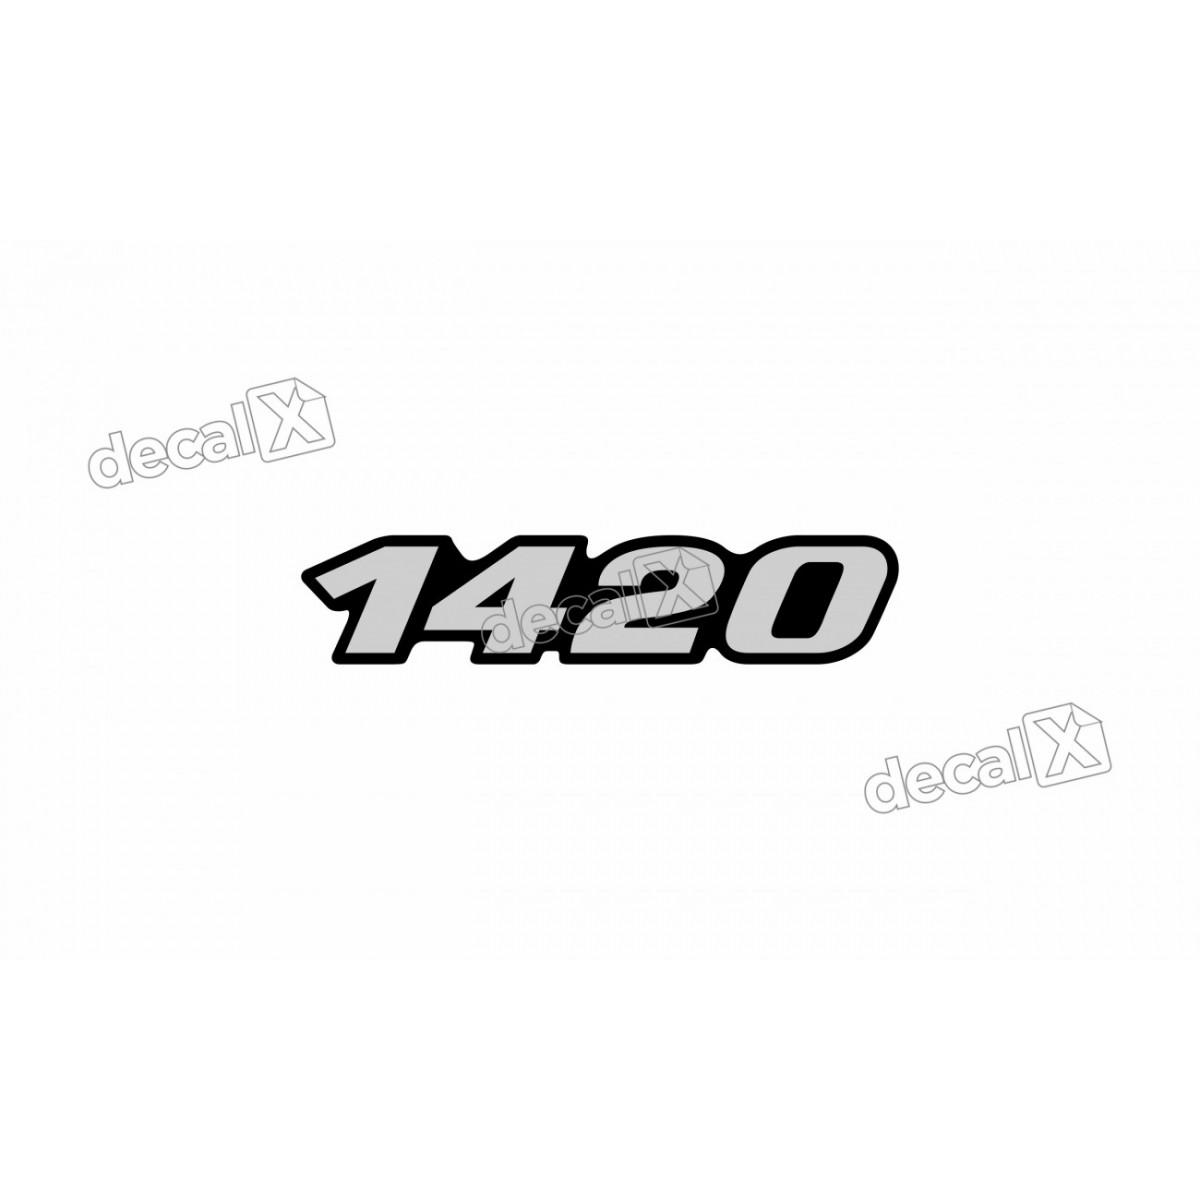 Adesivo Emblema Resinado Mercedes 1420 Cm31 Decalx